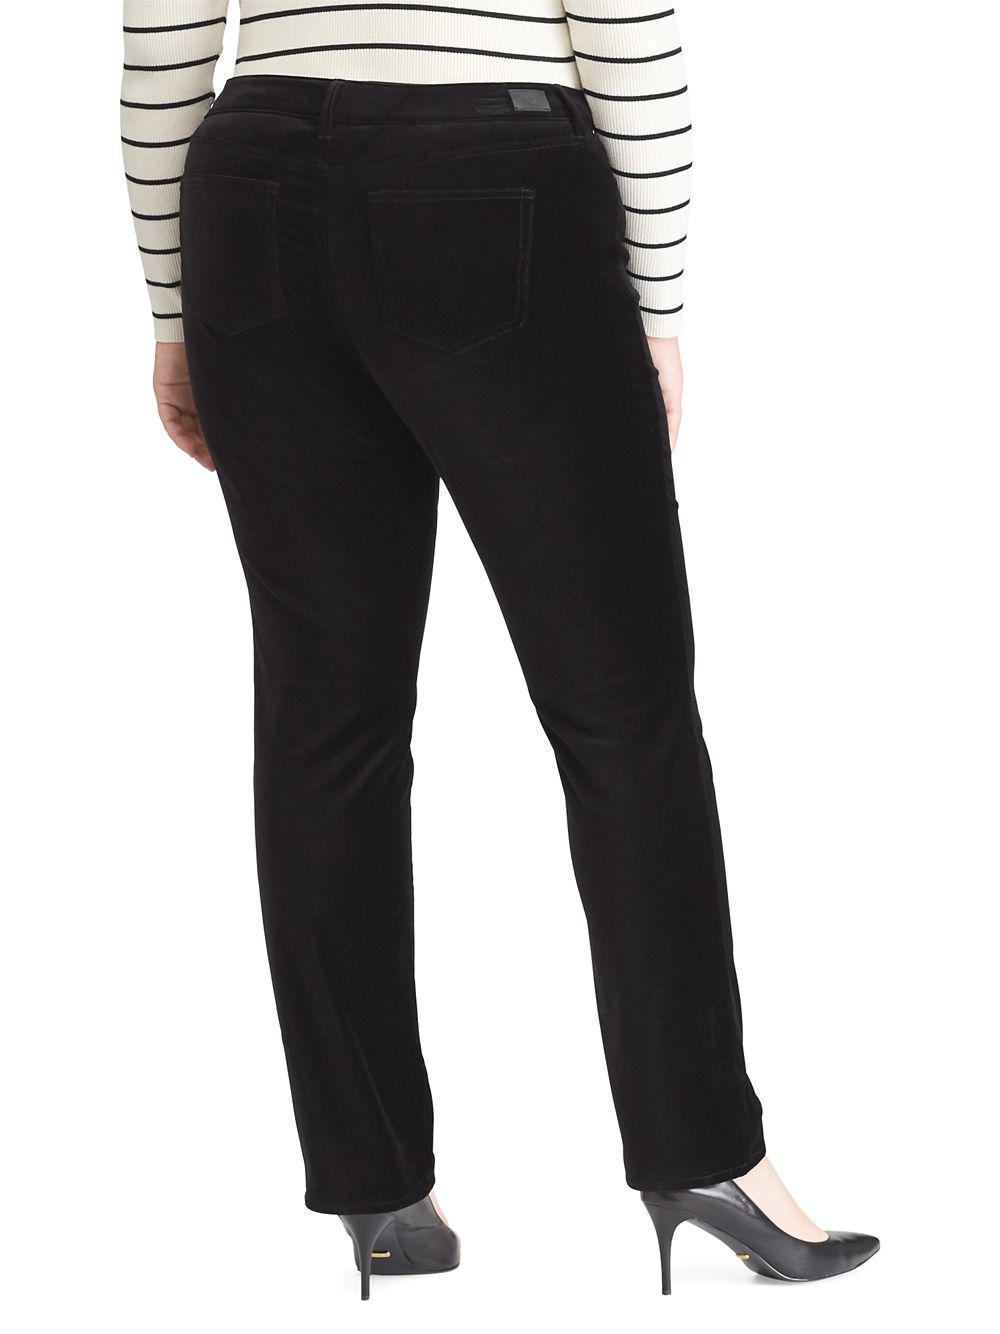 e2ec9cbdb7146 Lauren by Ralph Lauren - Black Plus Plus Stretch Velvet Premier Straight  Pants - Lyst. View fullscreen